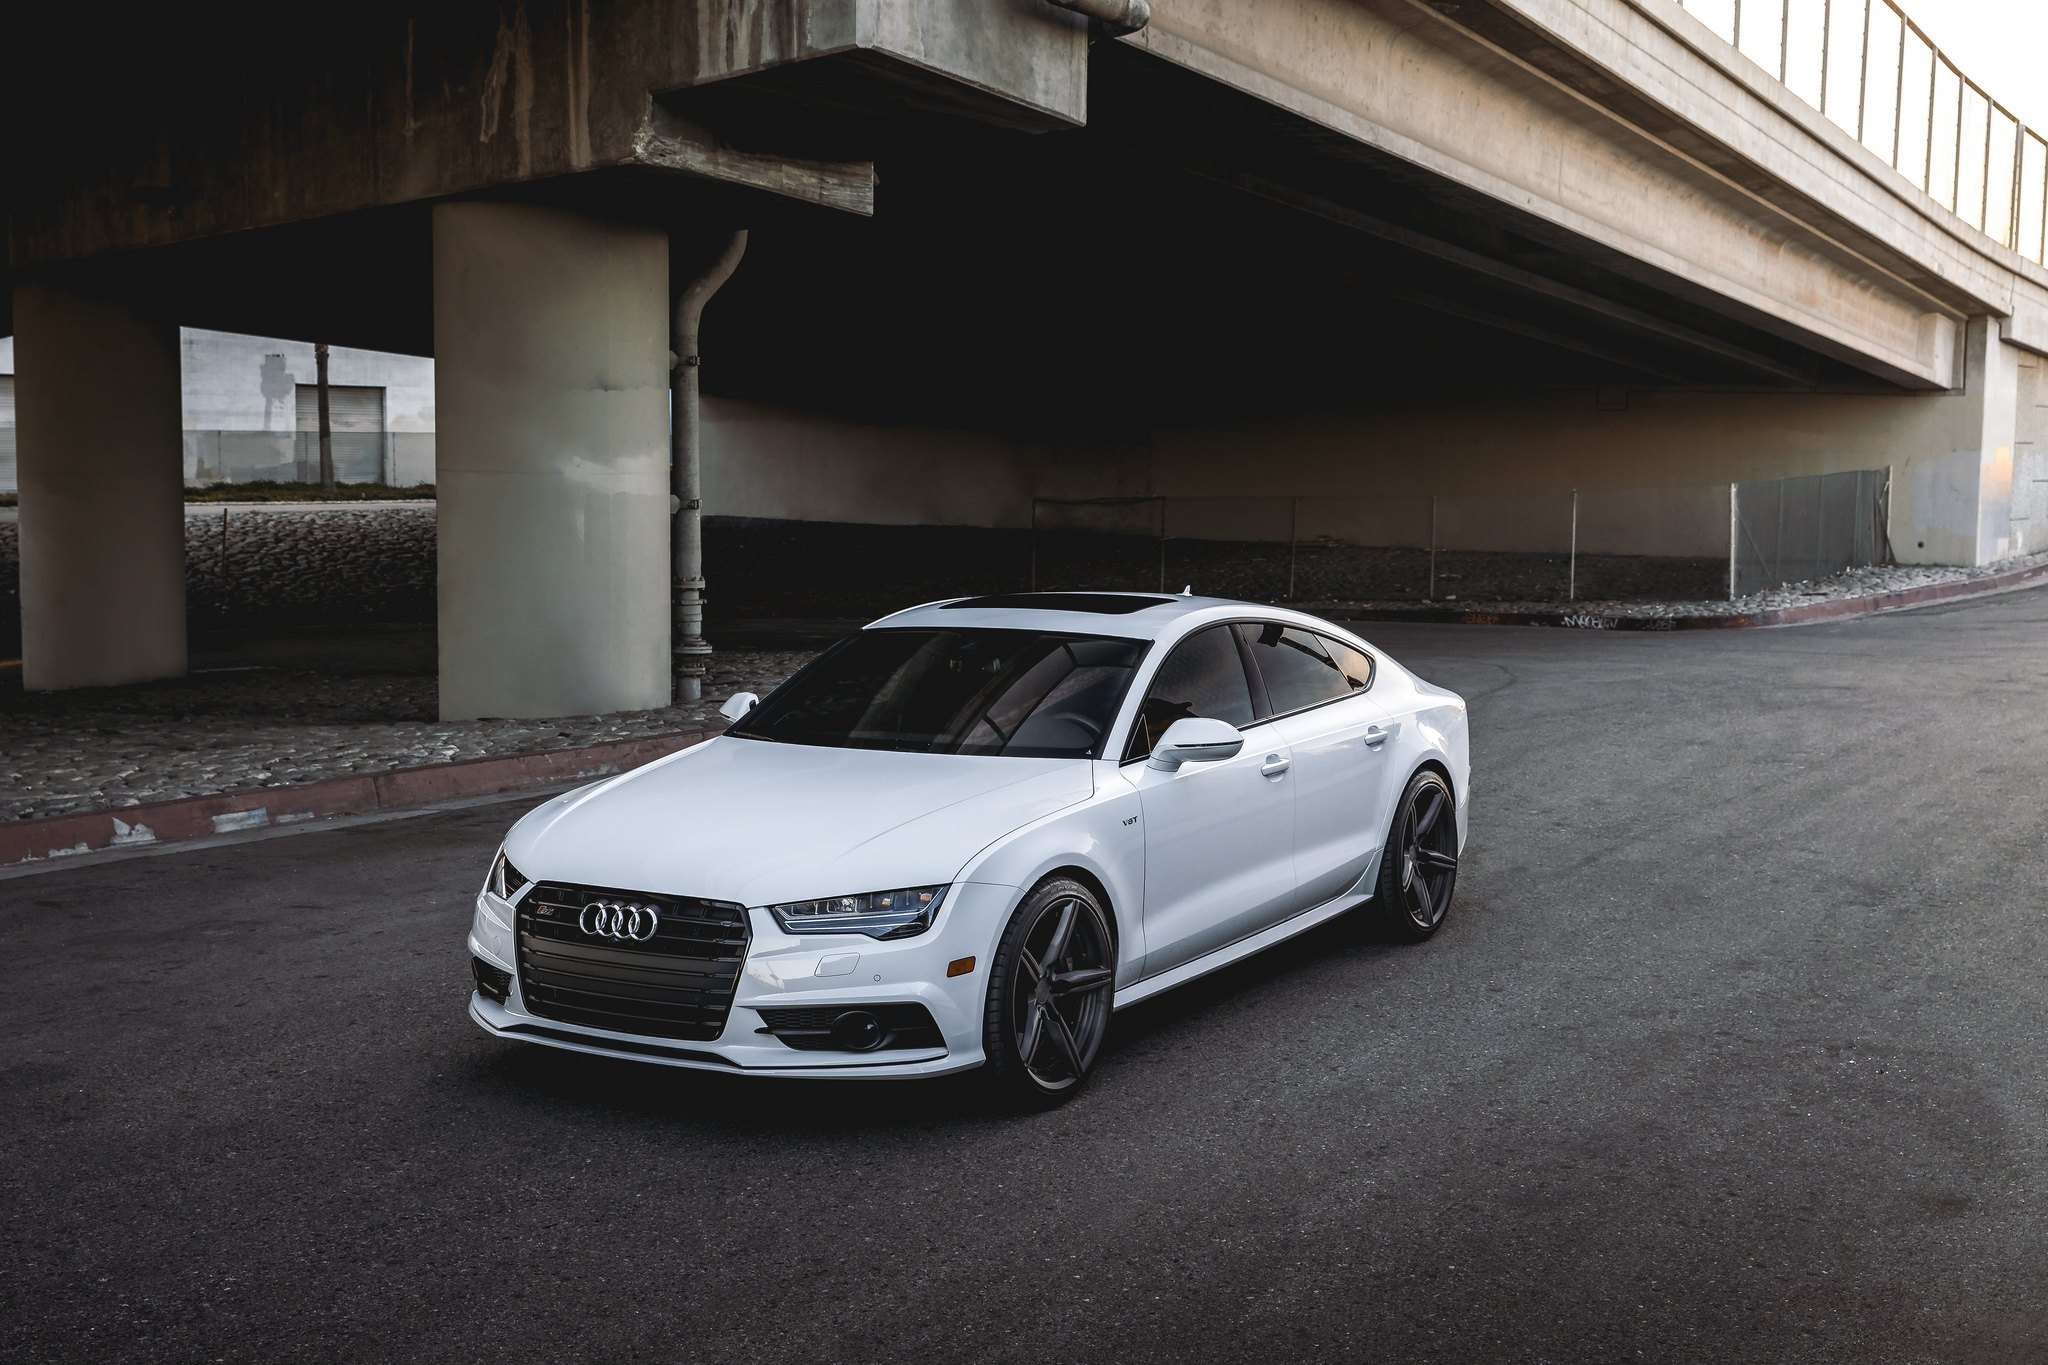 Custom 2018 Audi A7 Images Mods Photos Upgrades